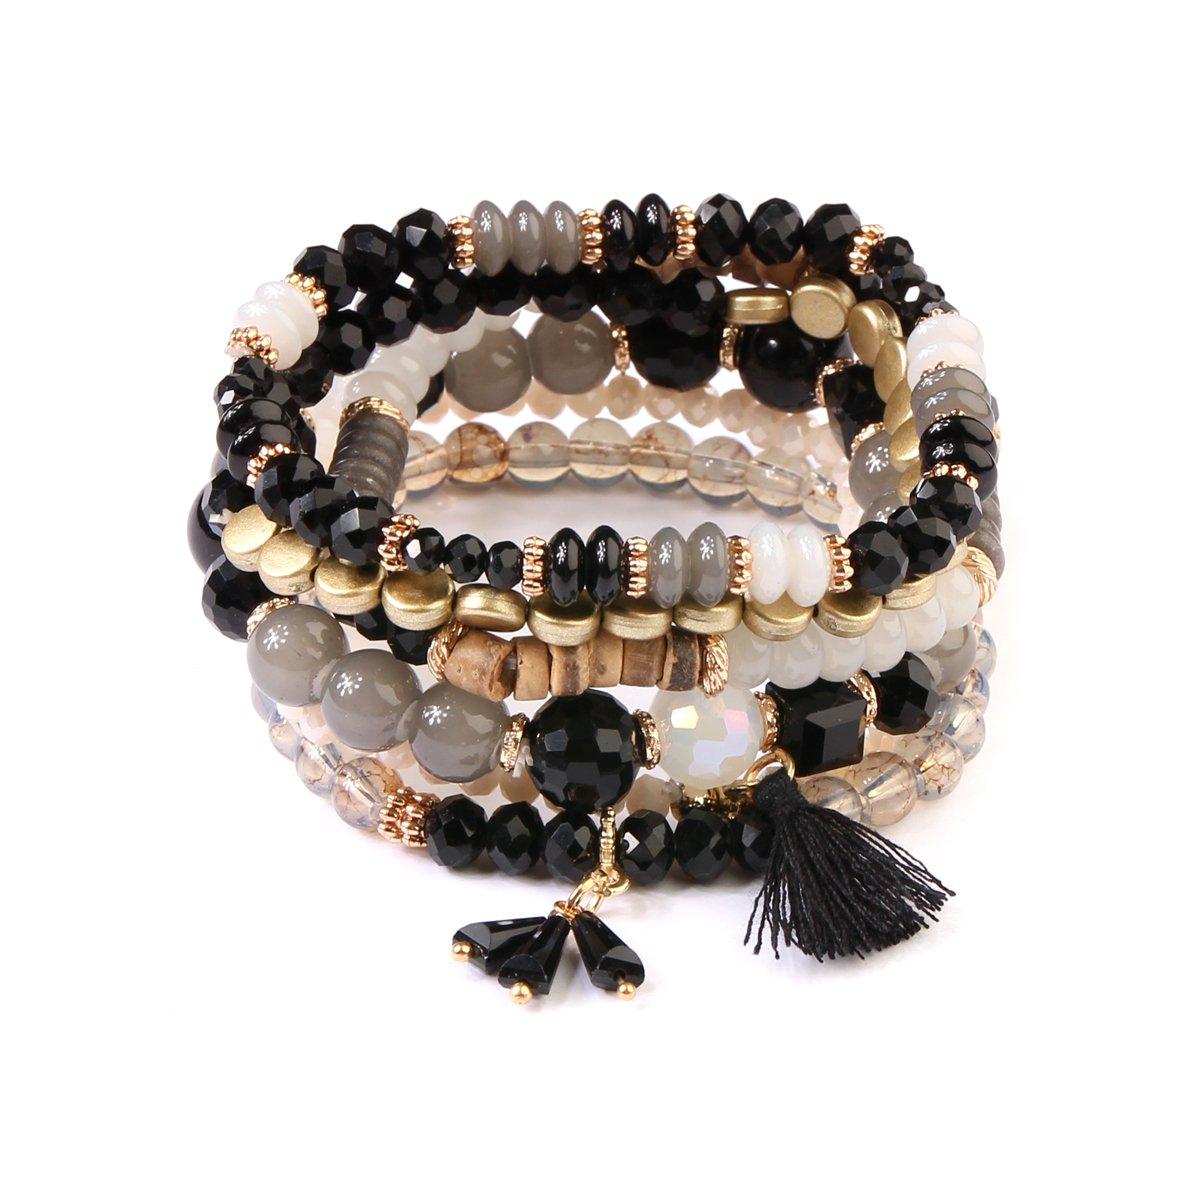 kpajewelry KPA Fashion Women's Multi Bead Tassel Stretch Bracelet - Colorful Beaded Layering Statement Bangles (Black)